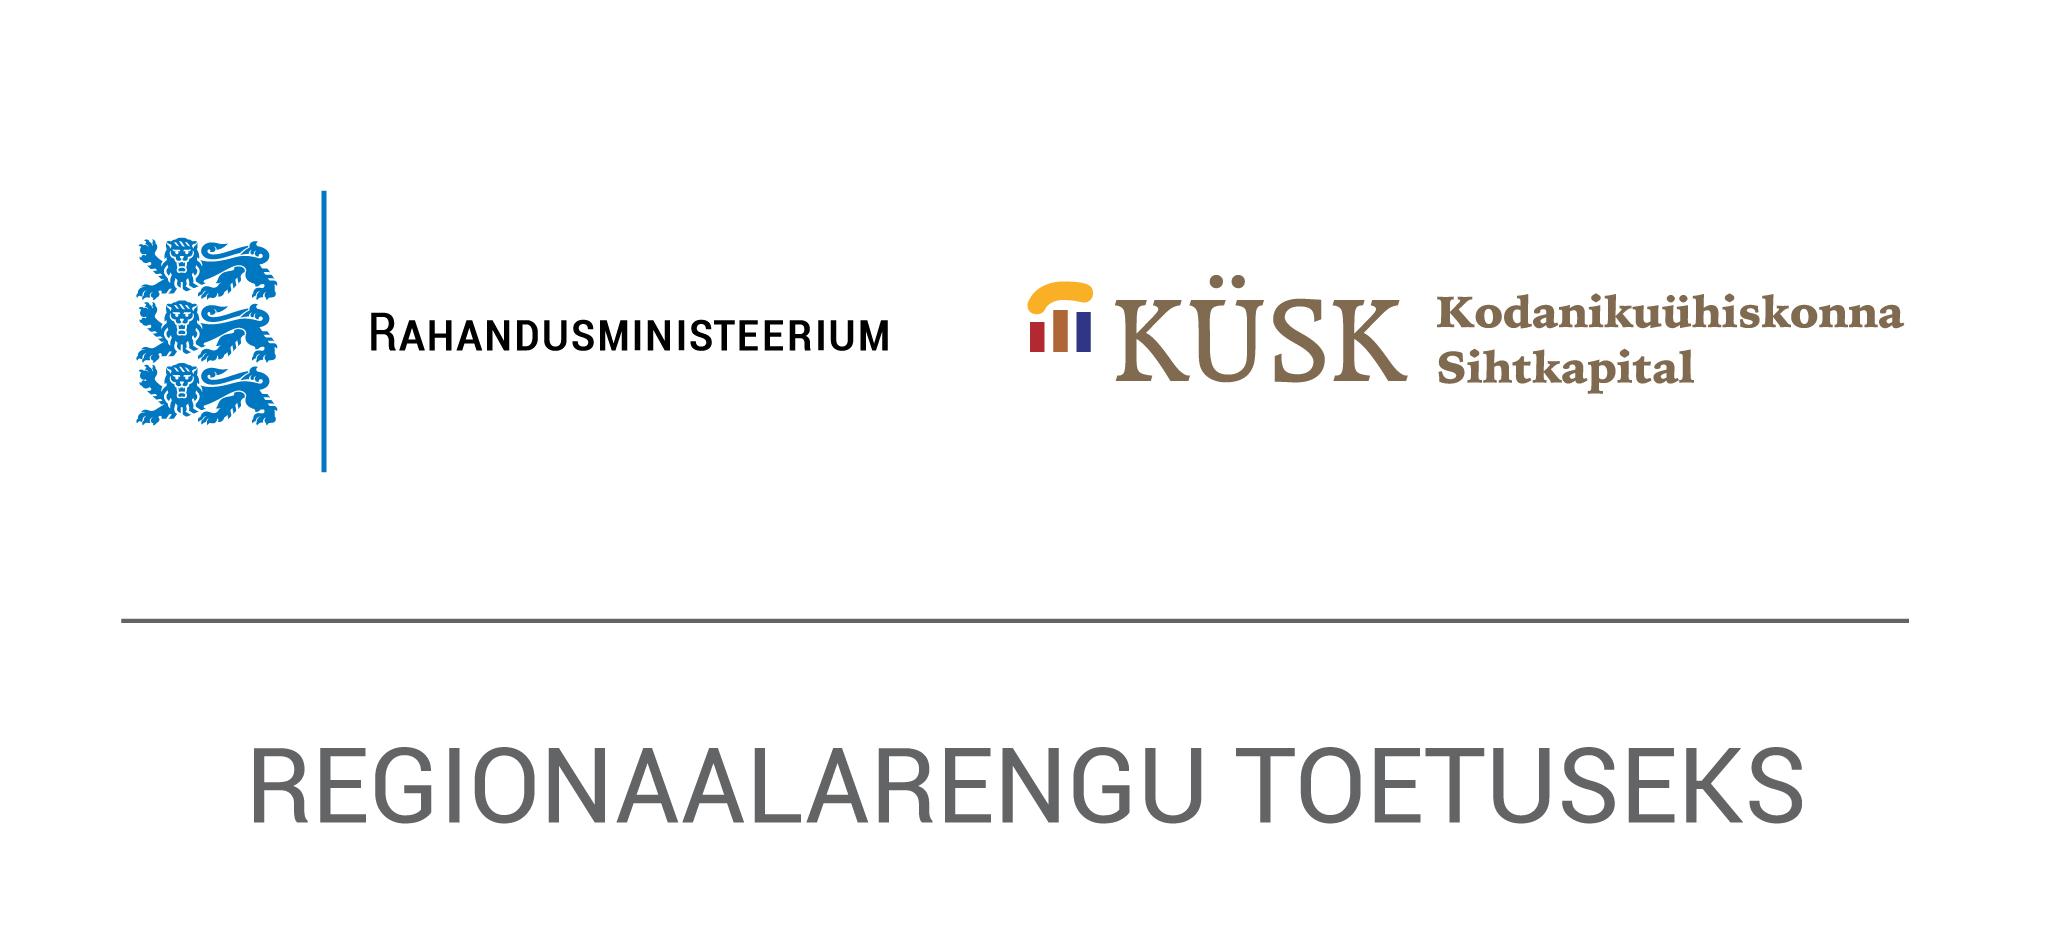 http://www.kysk.ee/failid/Upload/files/Kop/Logod/RM-KYSK_logo_reg_toetuseks-Vektor-suur_sygis2015.jpg